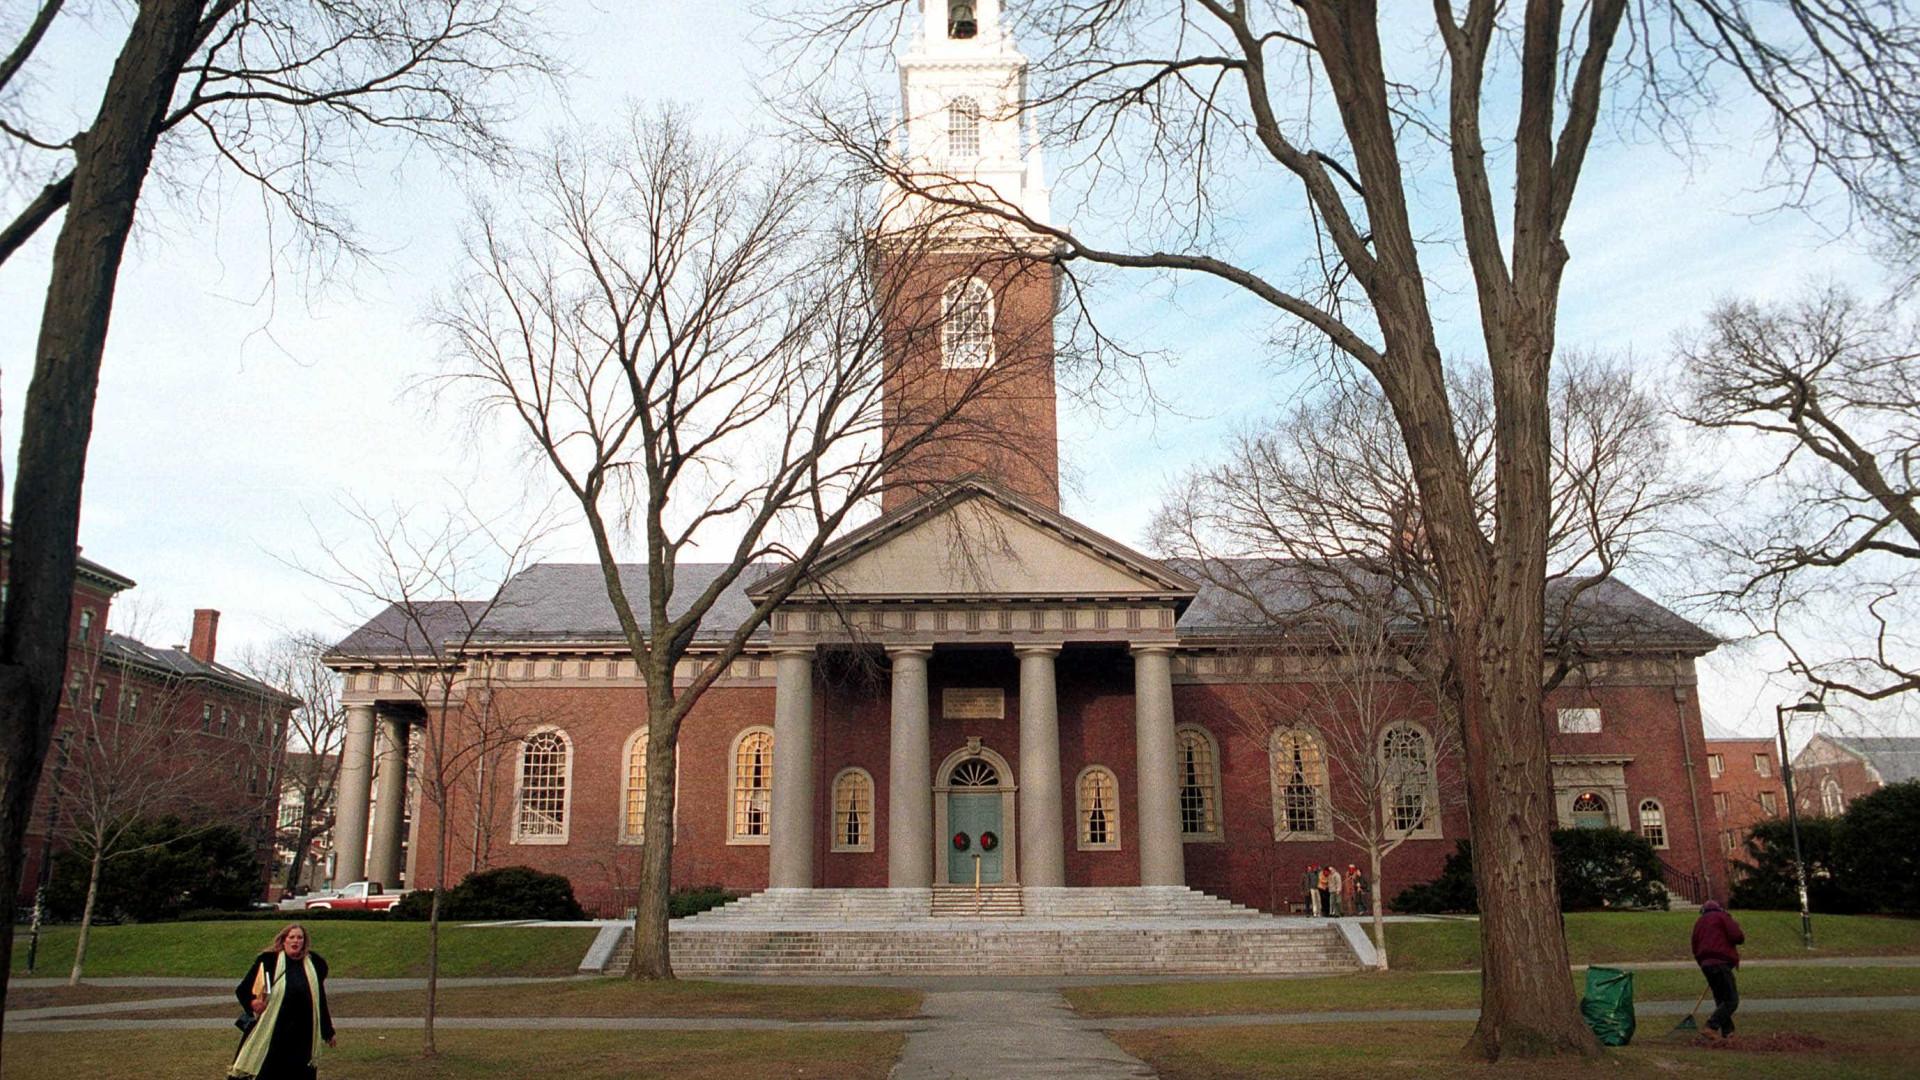 Harvard cancela matrícula de alunos que publicaram memes ofensivos